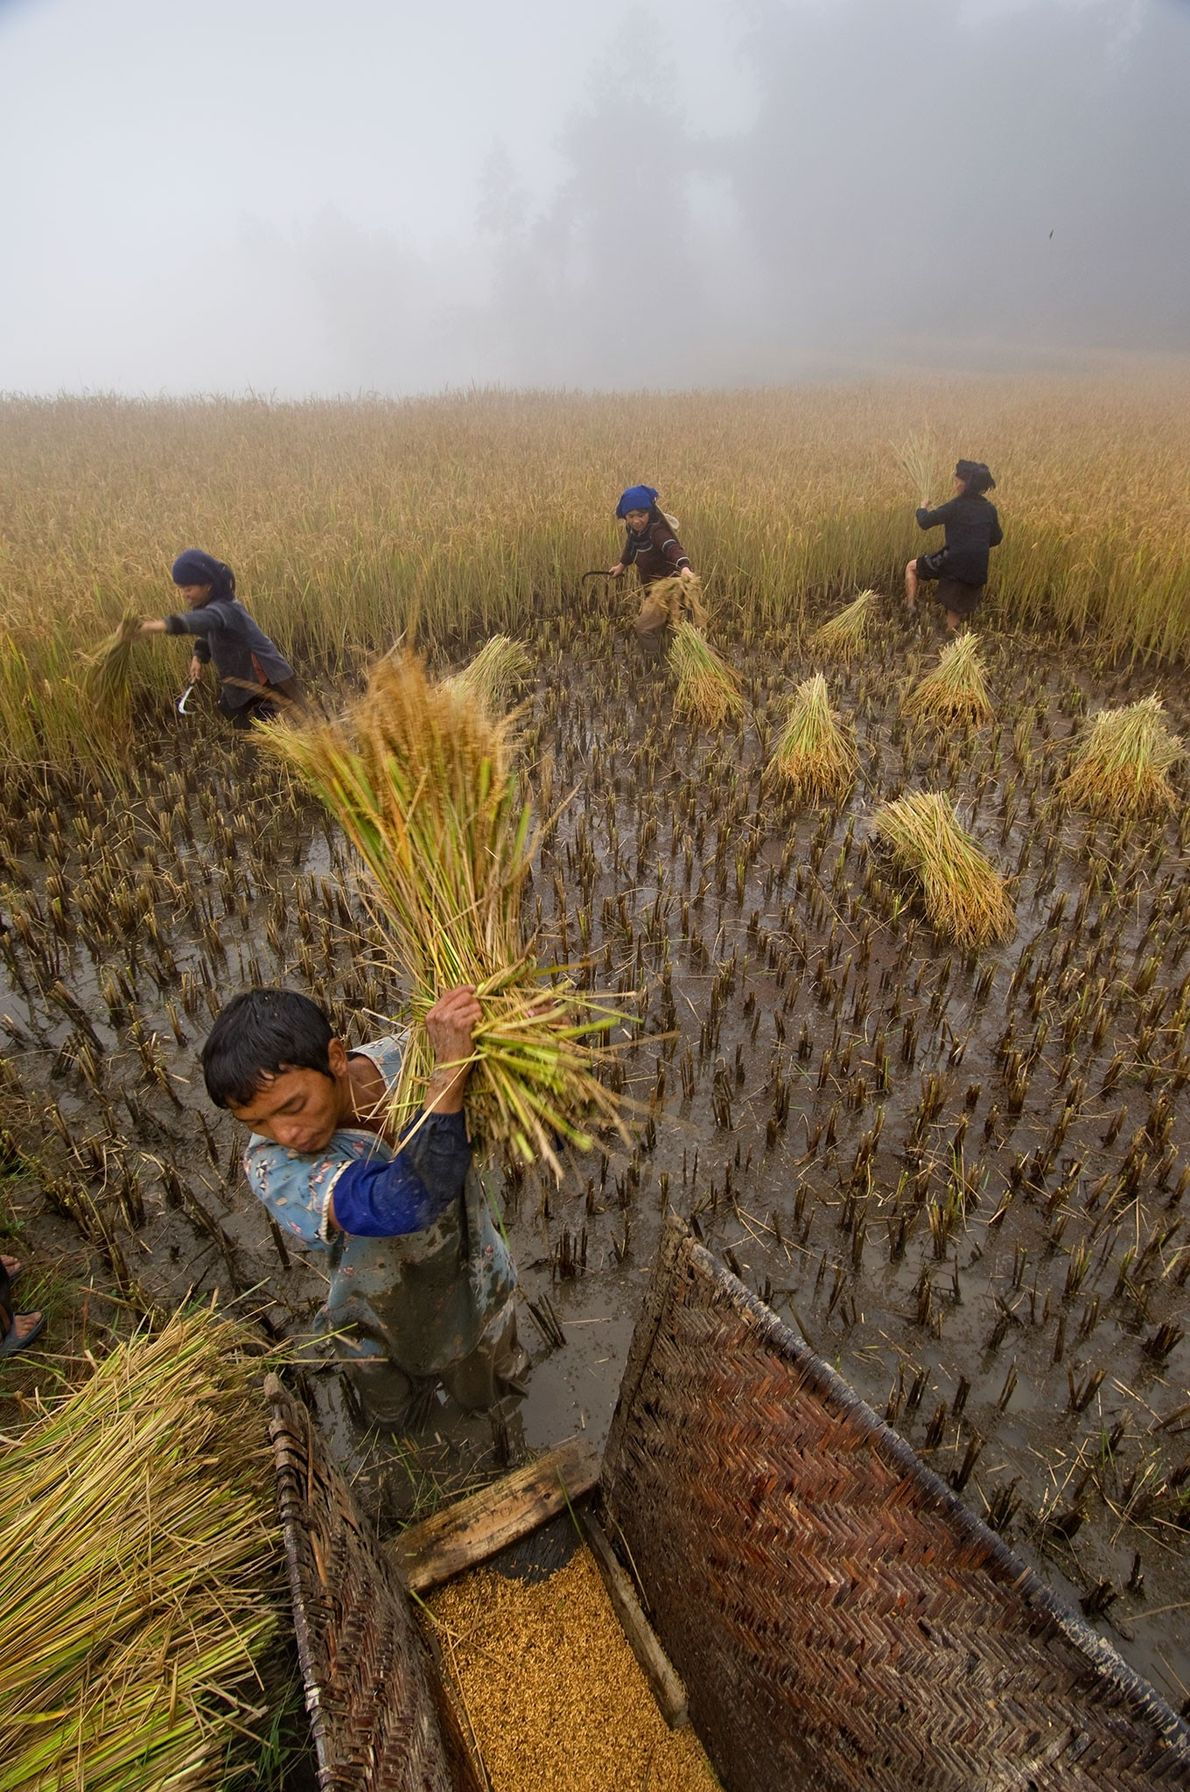 The Li Kaixin family harvests rice near Sheng Cun, a village in China's southern Yunnan province. …